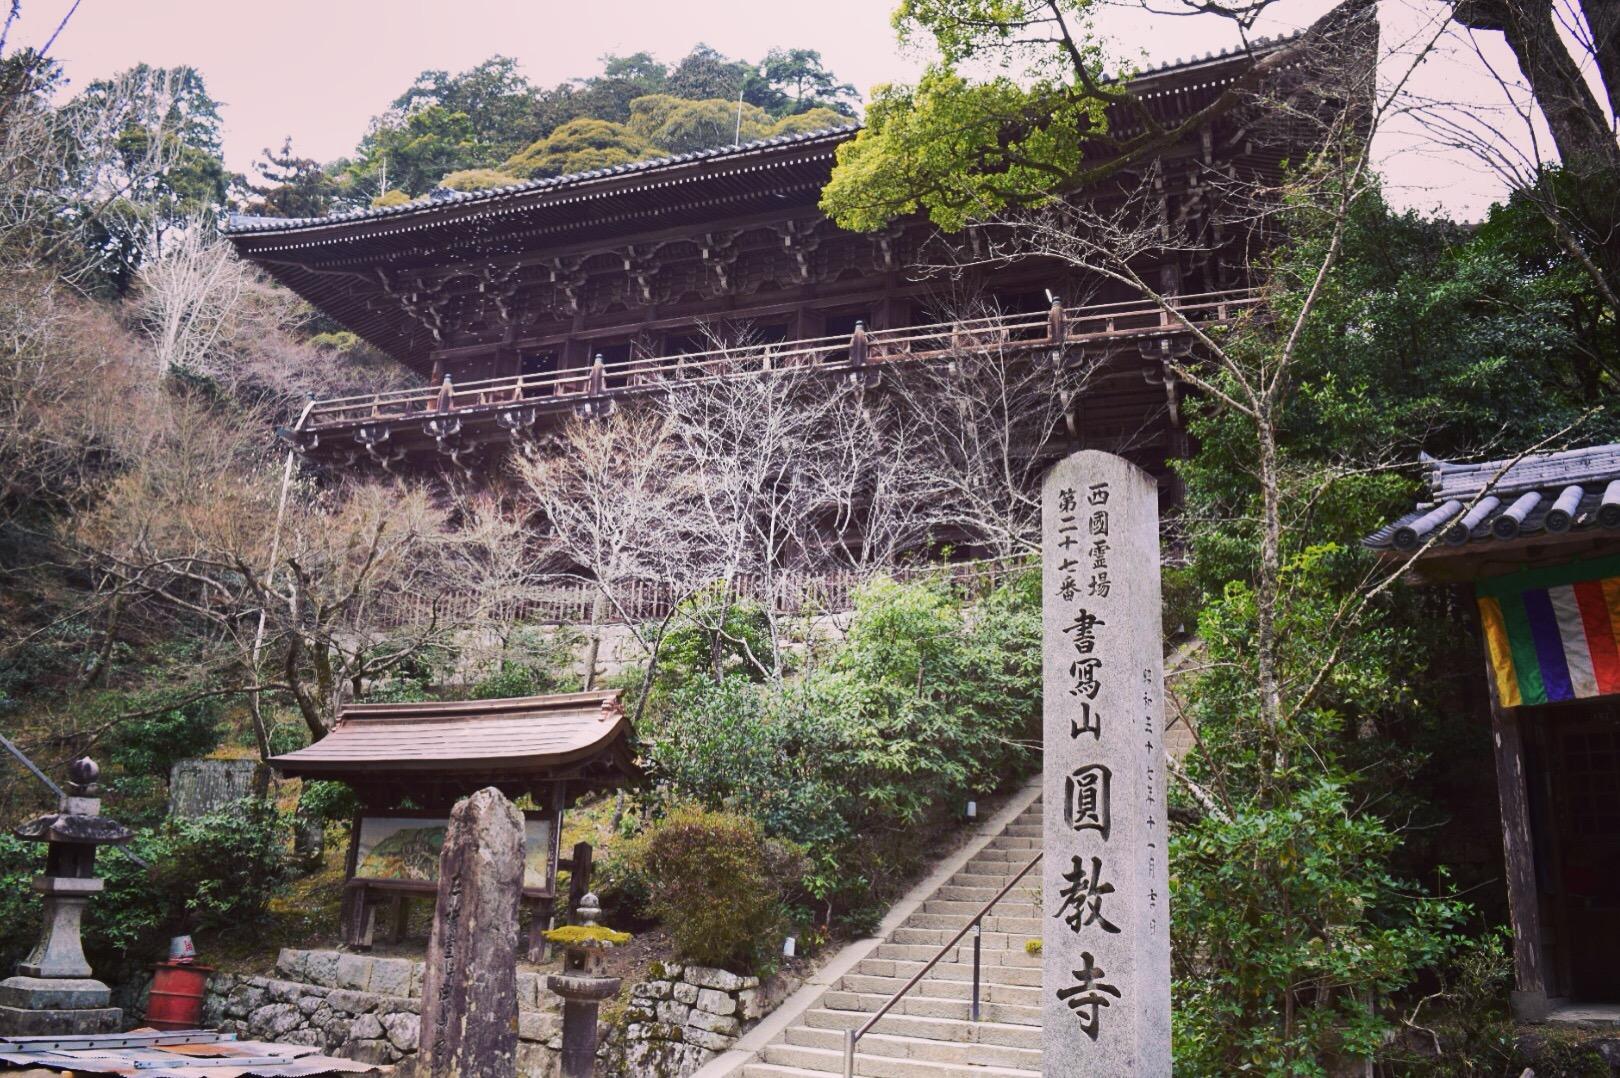 書写山園教寺の摩尼殿